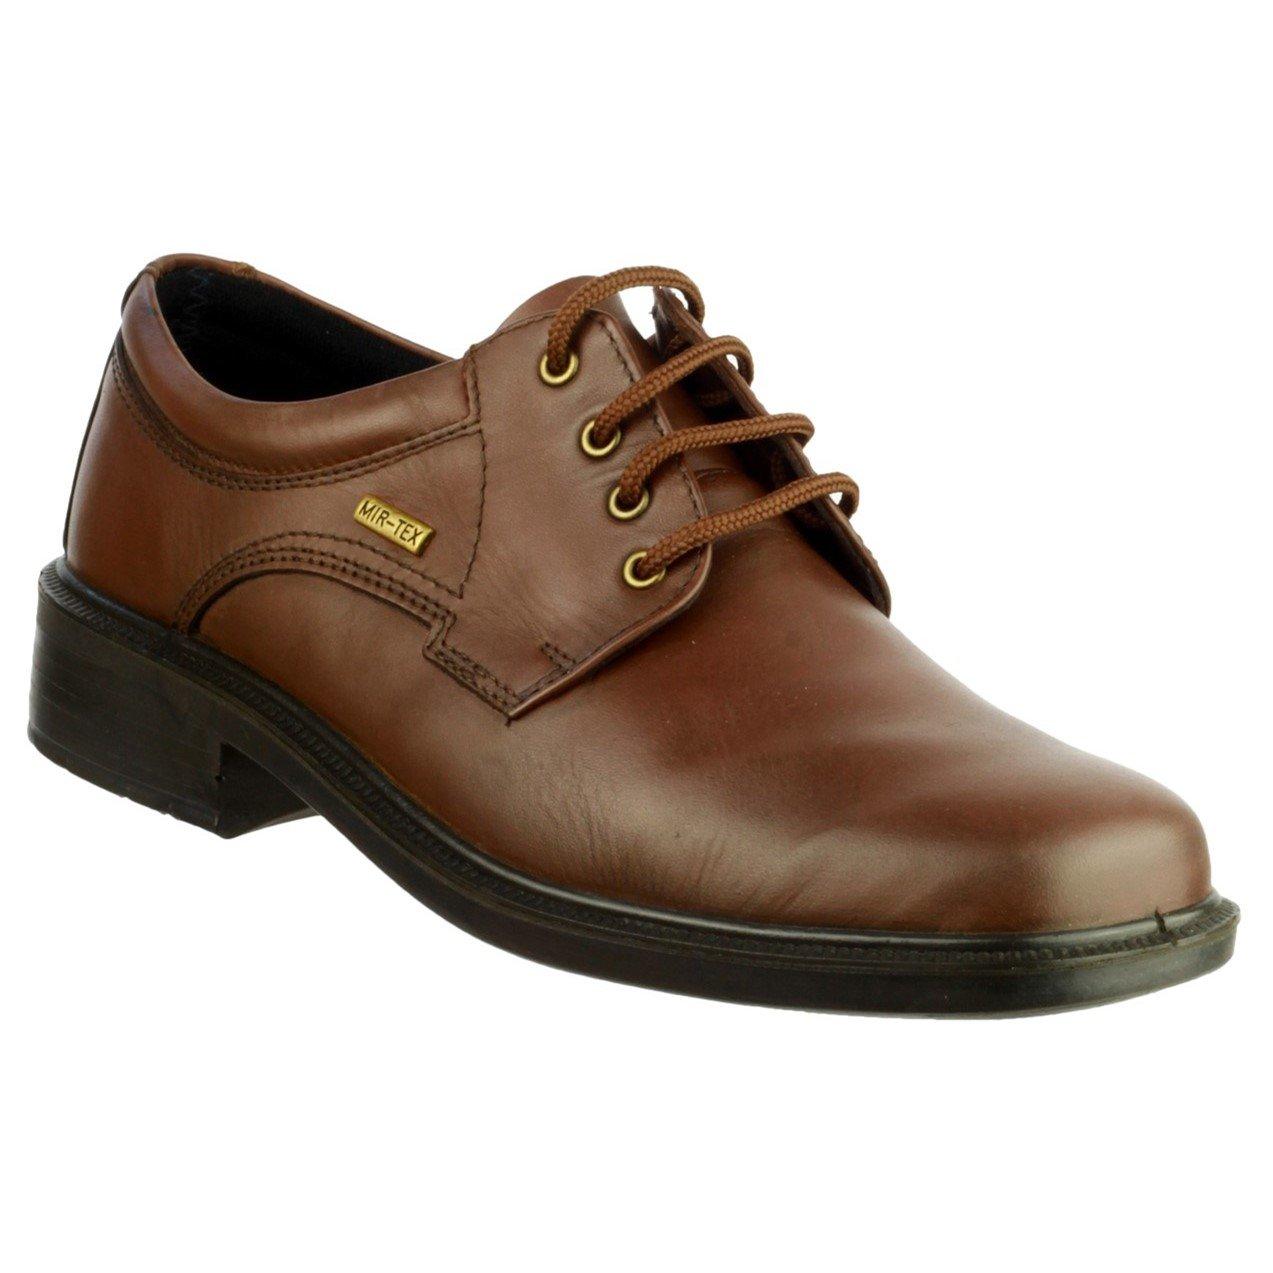 Cotswold Men's Sudeley Waterproof Shoe Various Colours 32970 - Brown 11